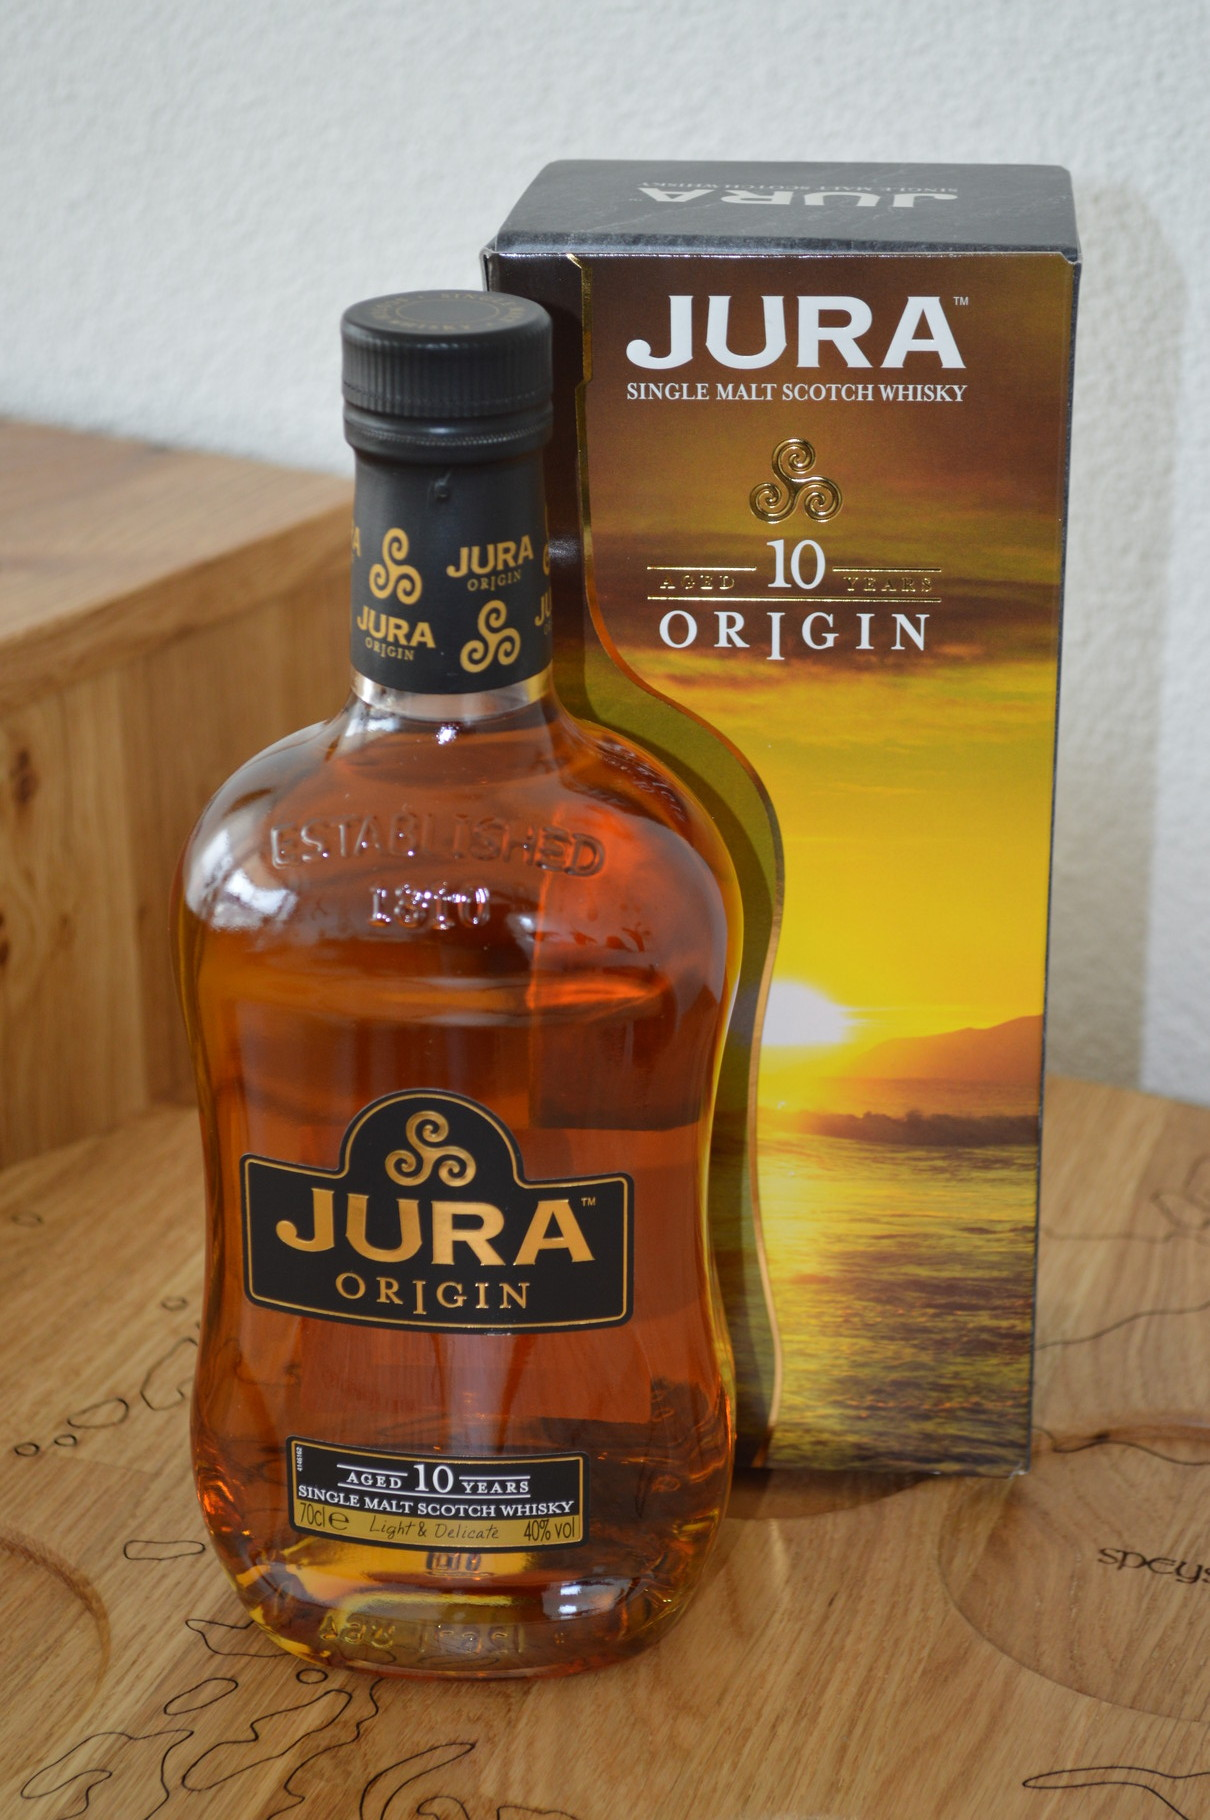 ISLANDS - Jura - Aged: 10 years - Bottler: Original - 70cl - 40% - Origin